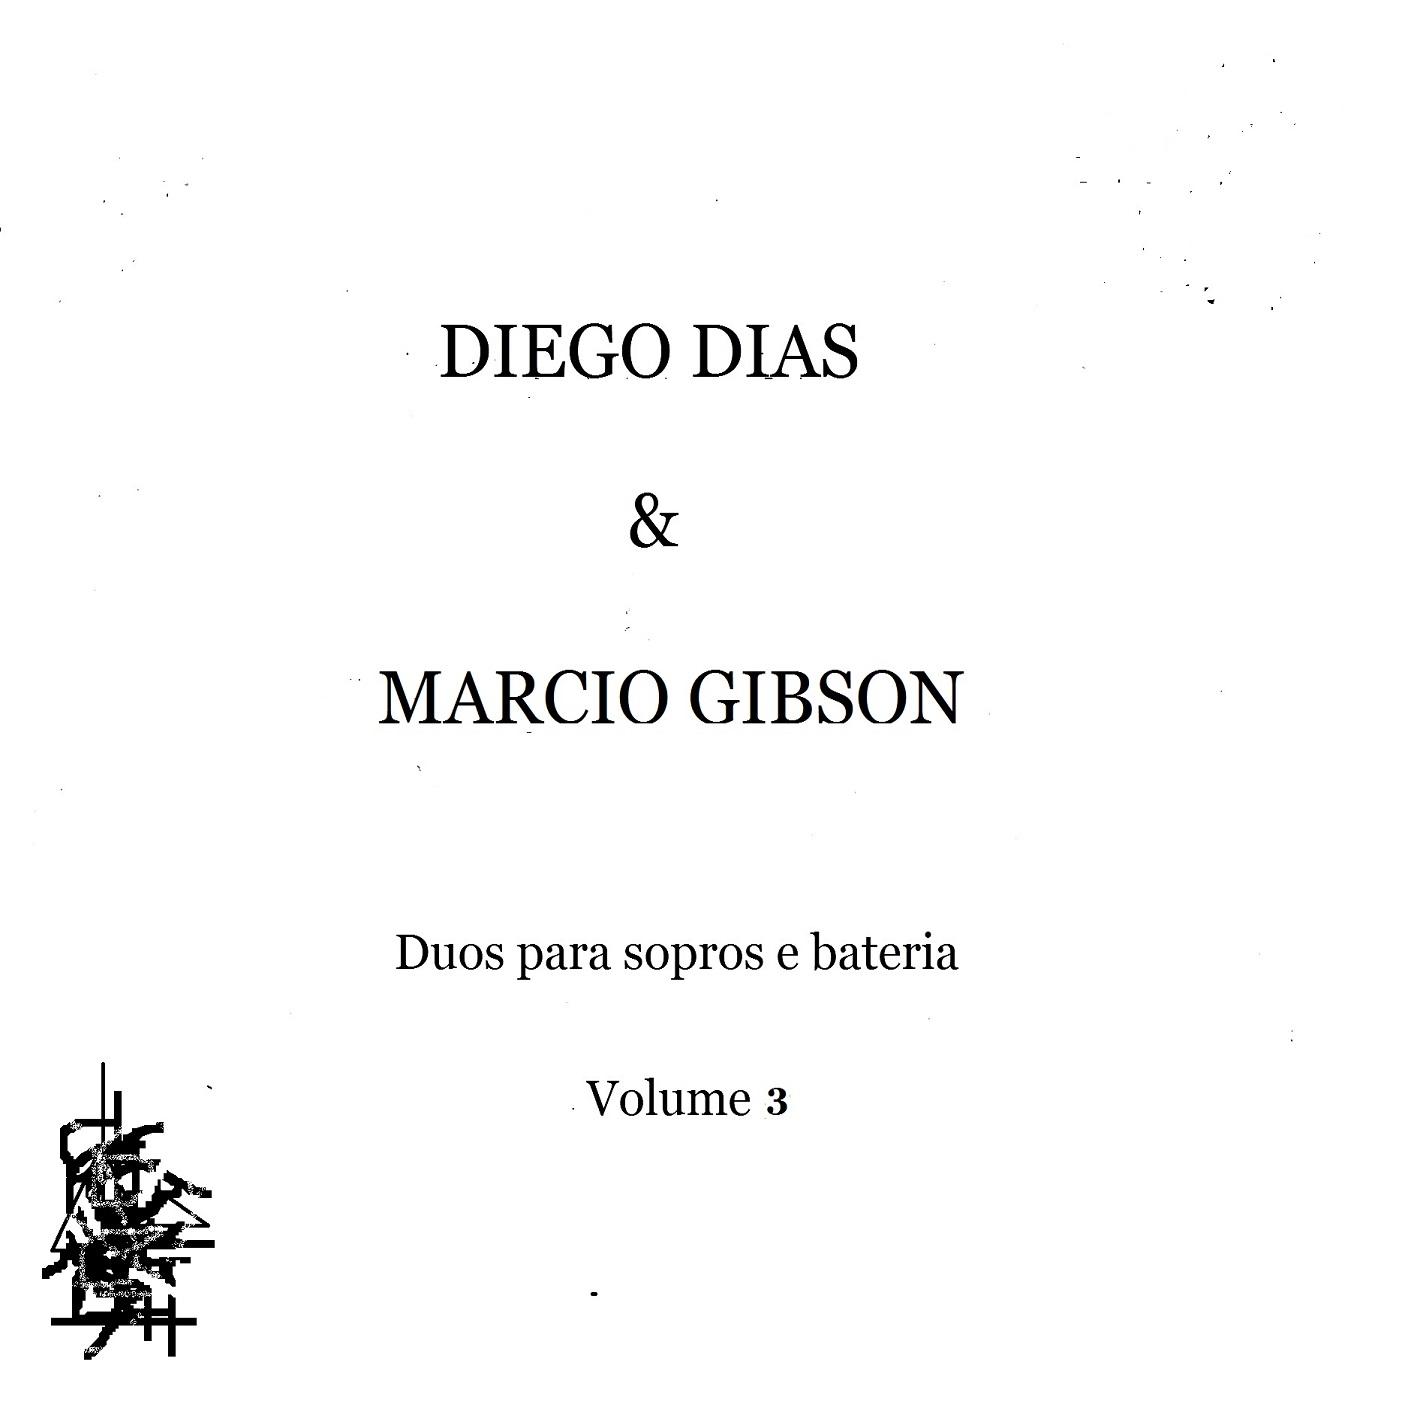 MSRCD049 - Diego Dias & Marcio Gibson - Duos para Sopros e Bateria Vol. 3